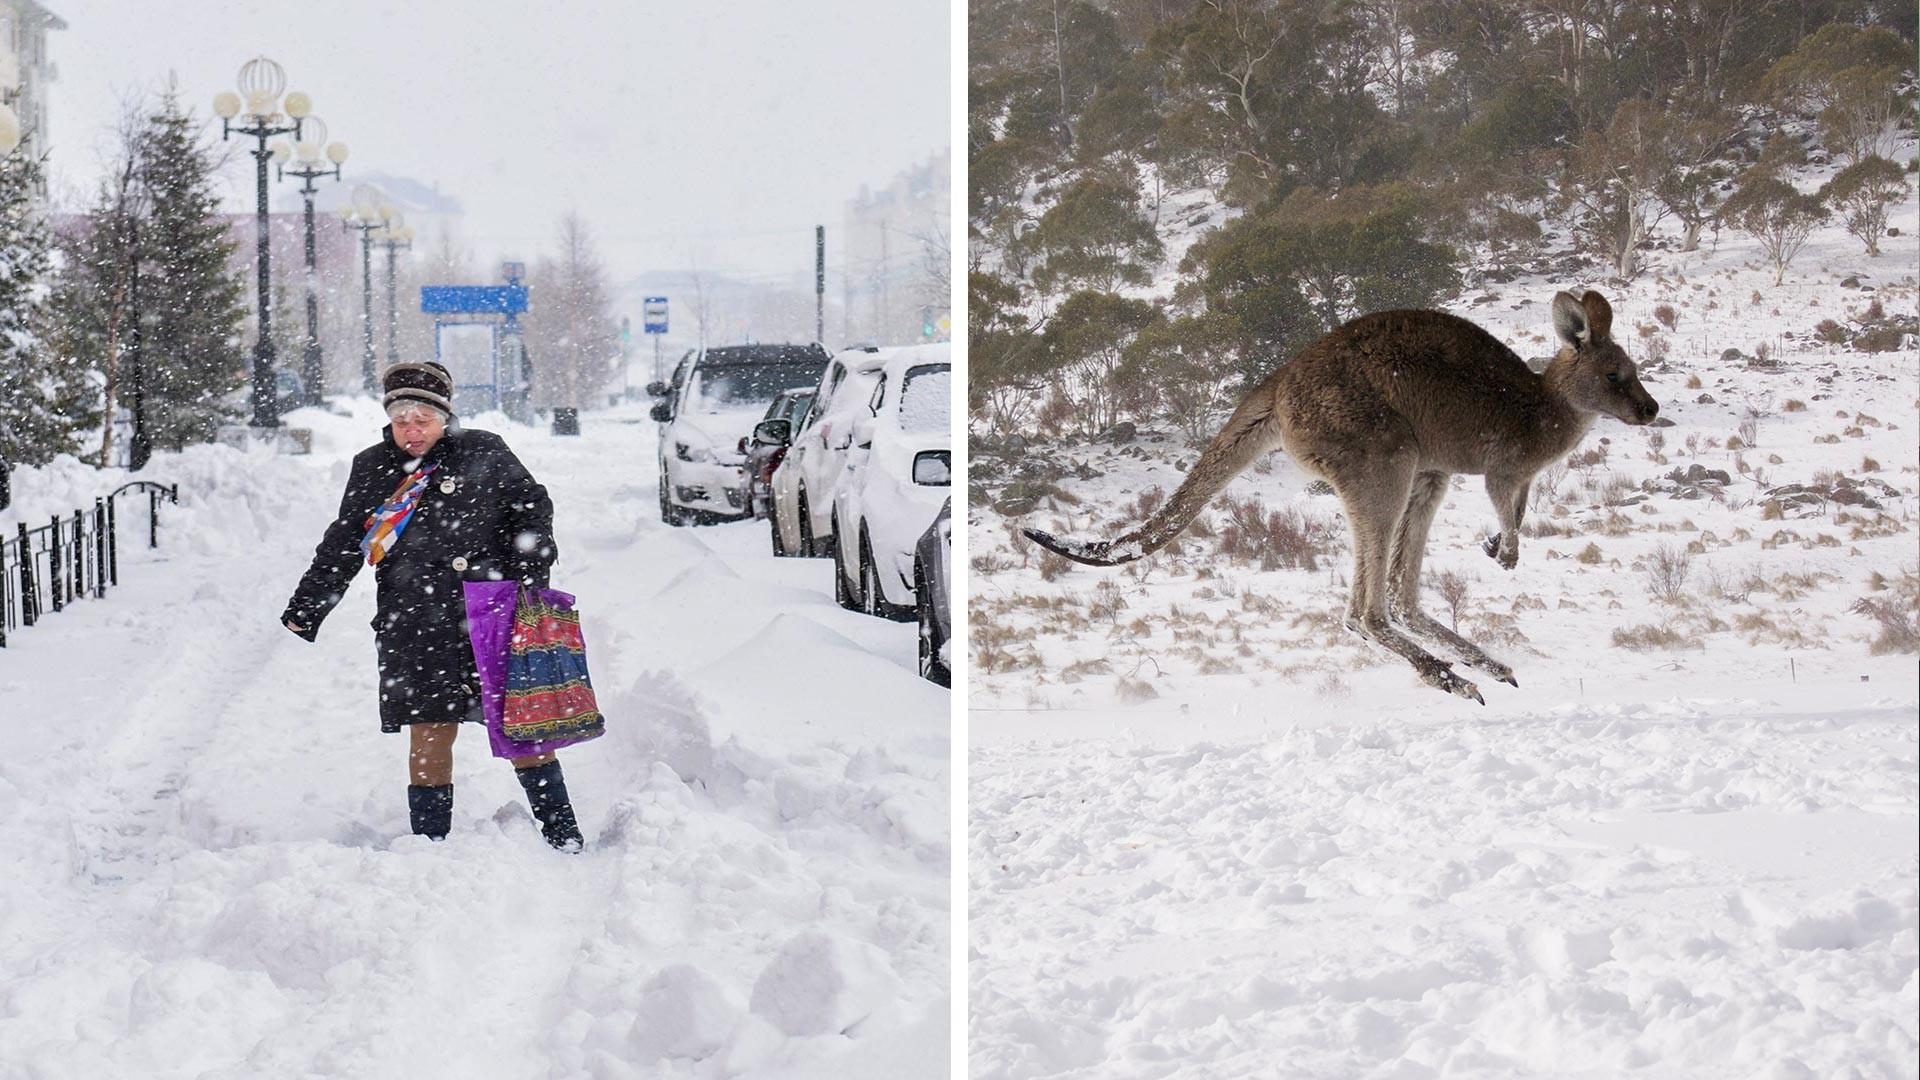 Hujan salju lebat di Salekhard pada akhir musim semi (kiri) dan seekor kanguru melompat di atas salju di Australia.